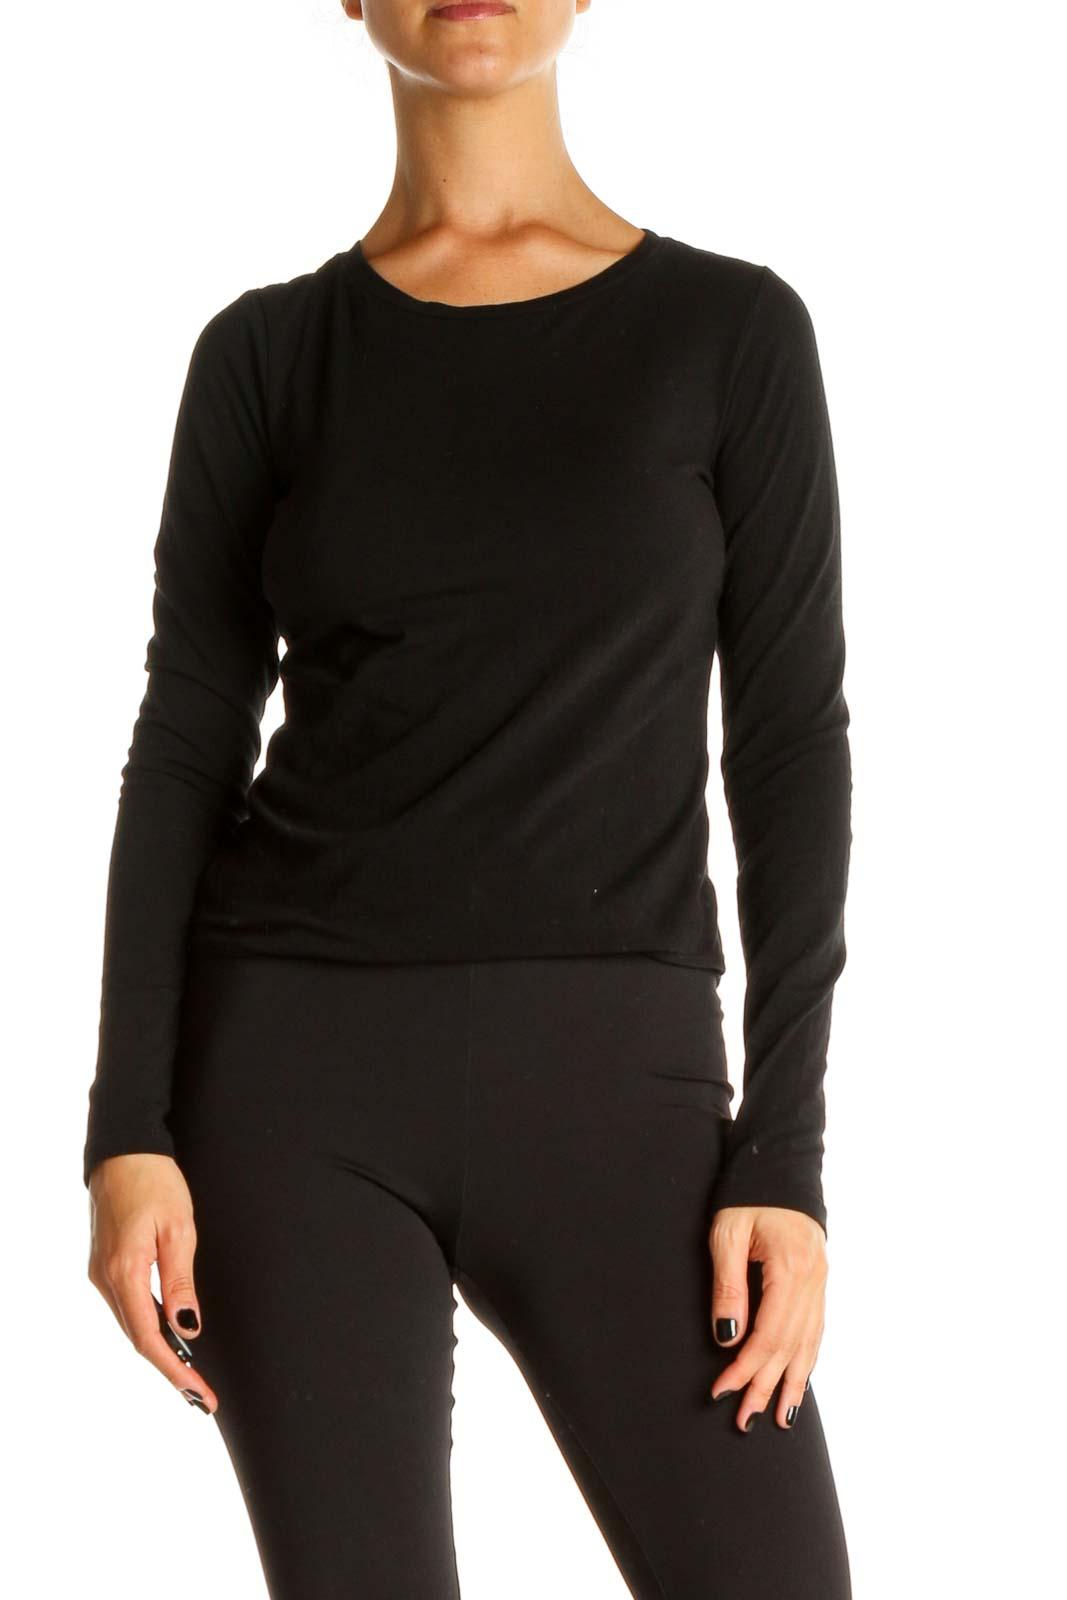 Black Solid Classic Bodysuit Front